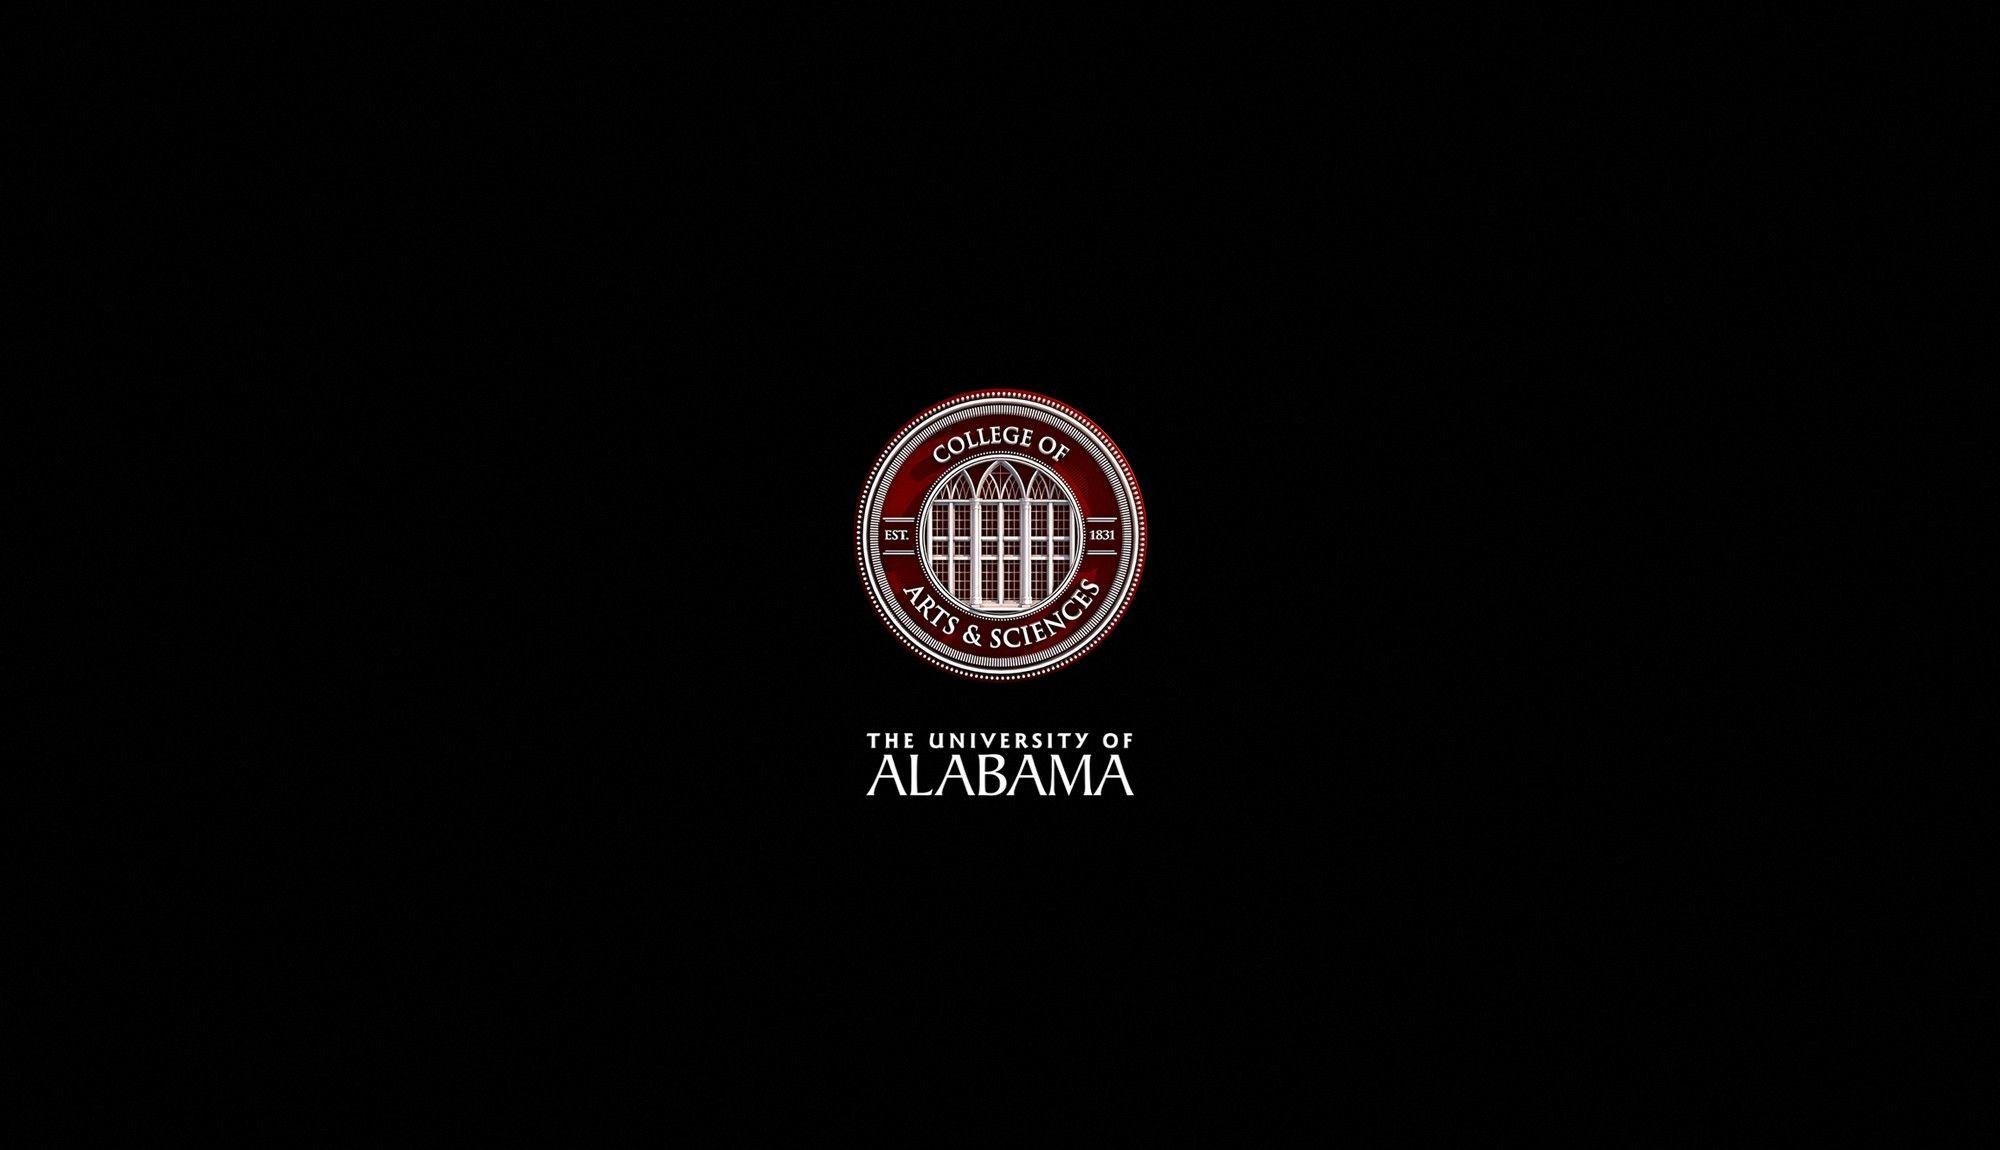 Alabama Screensavers Wallpapers: Alabama Football Screensavers And Wallpaper (68+ Images